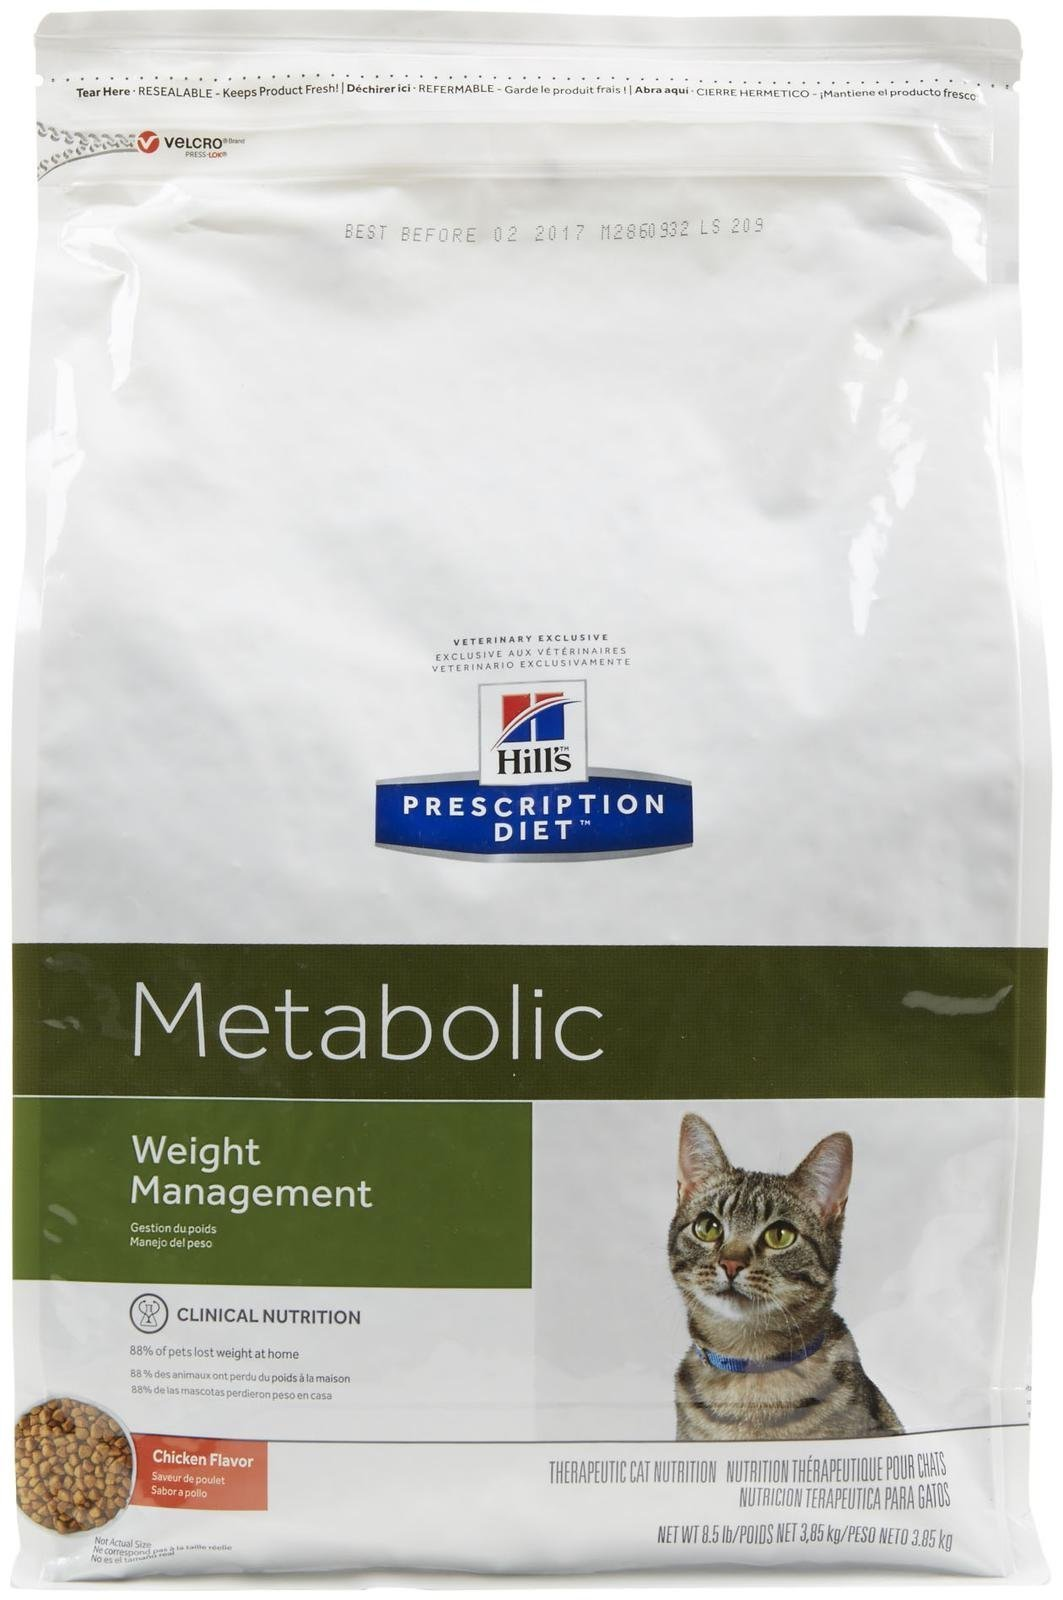 Hill's Prescription Diet Feline Metabolic Advanced Weight Solution Dry Cat Food, 8.5-lb bag